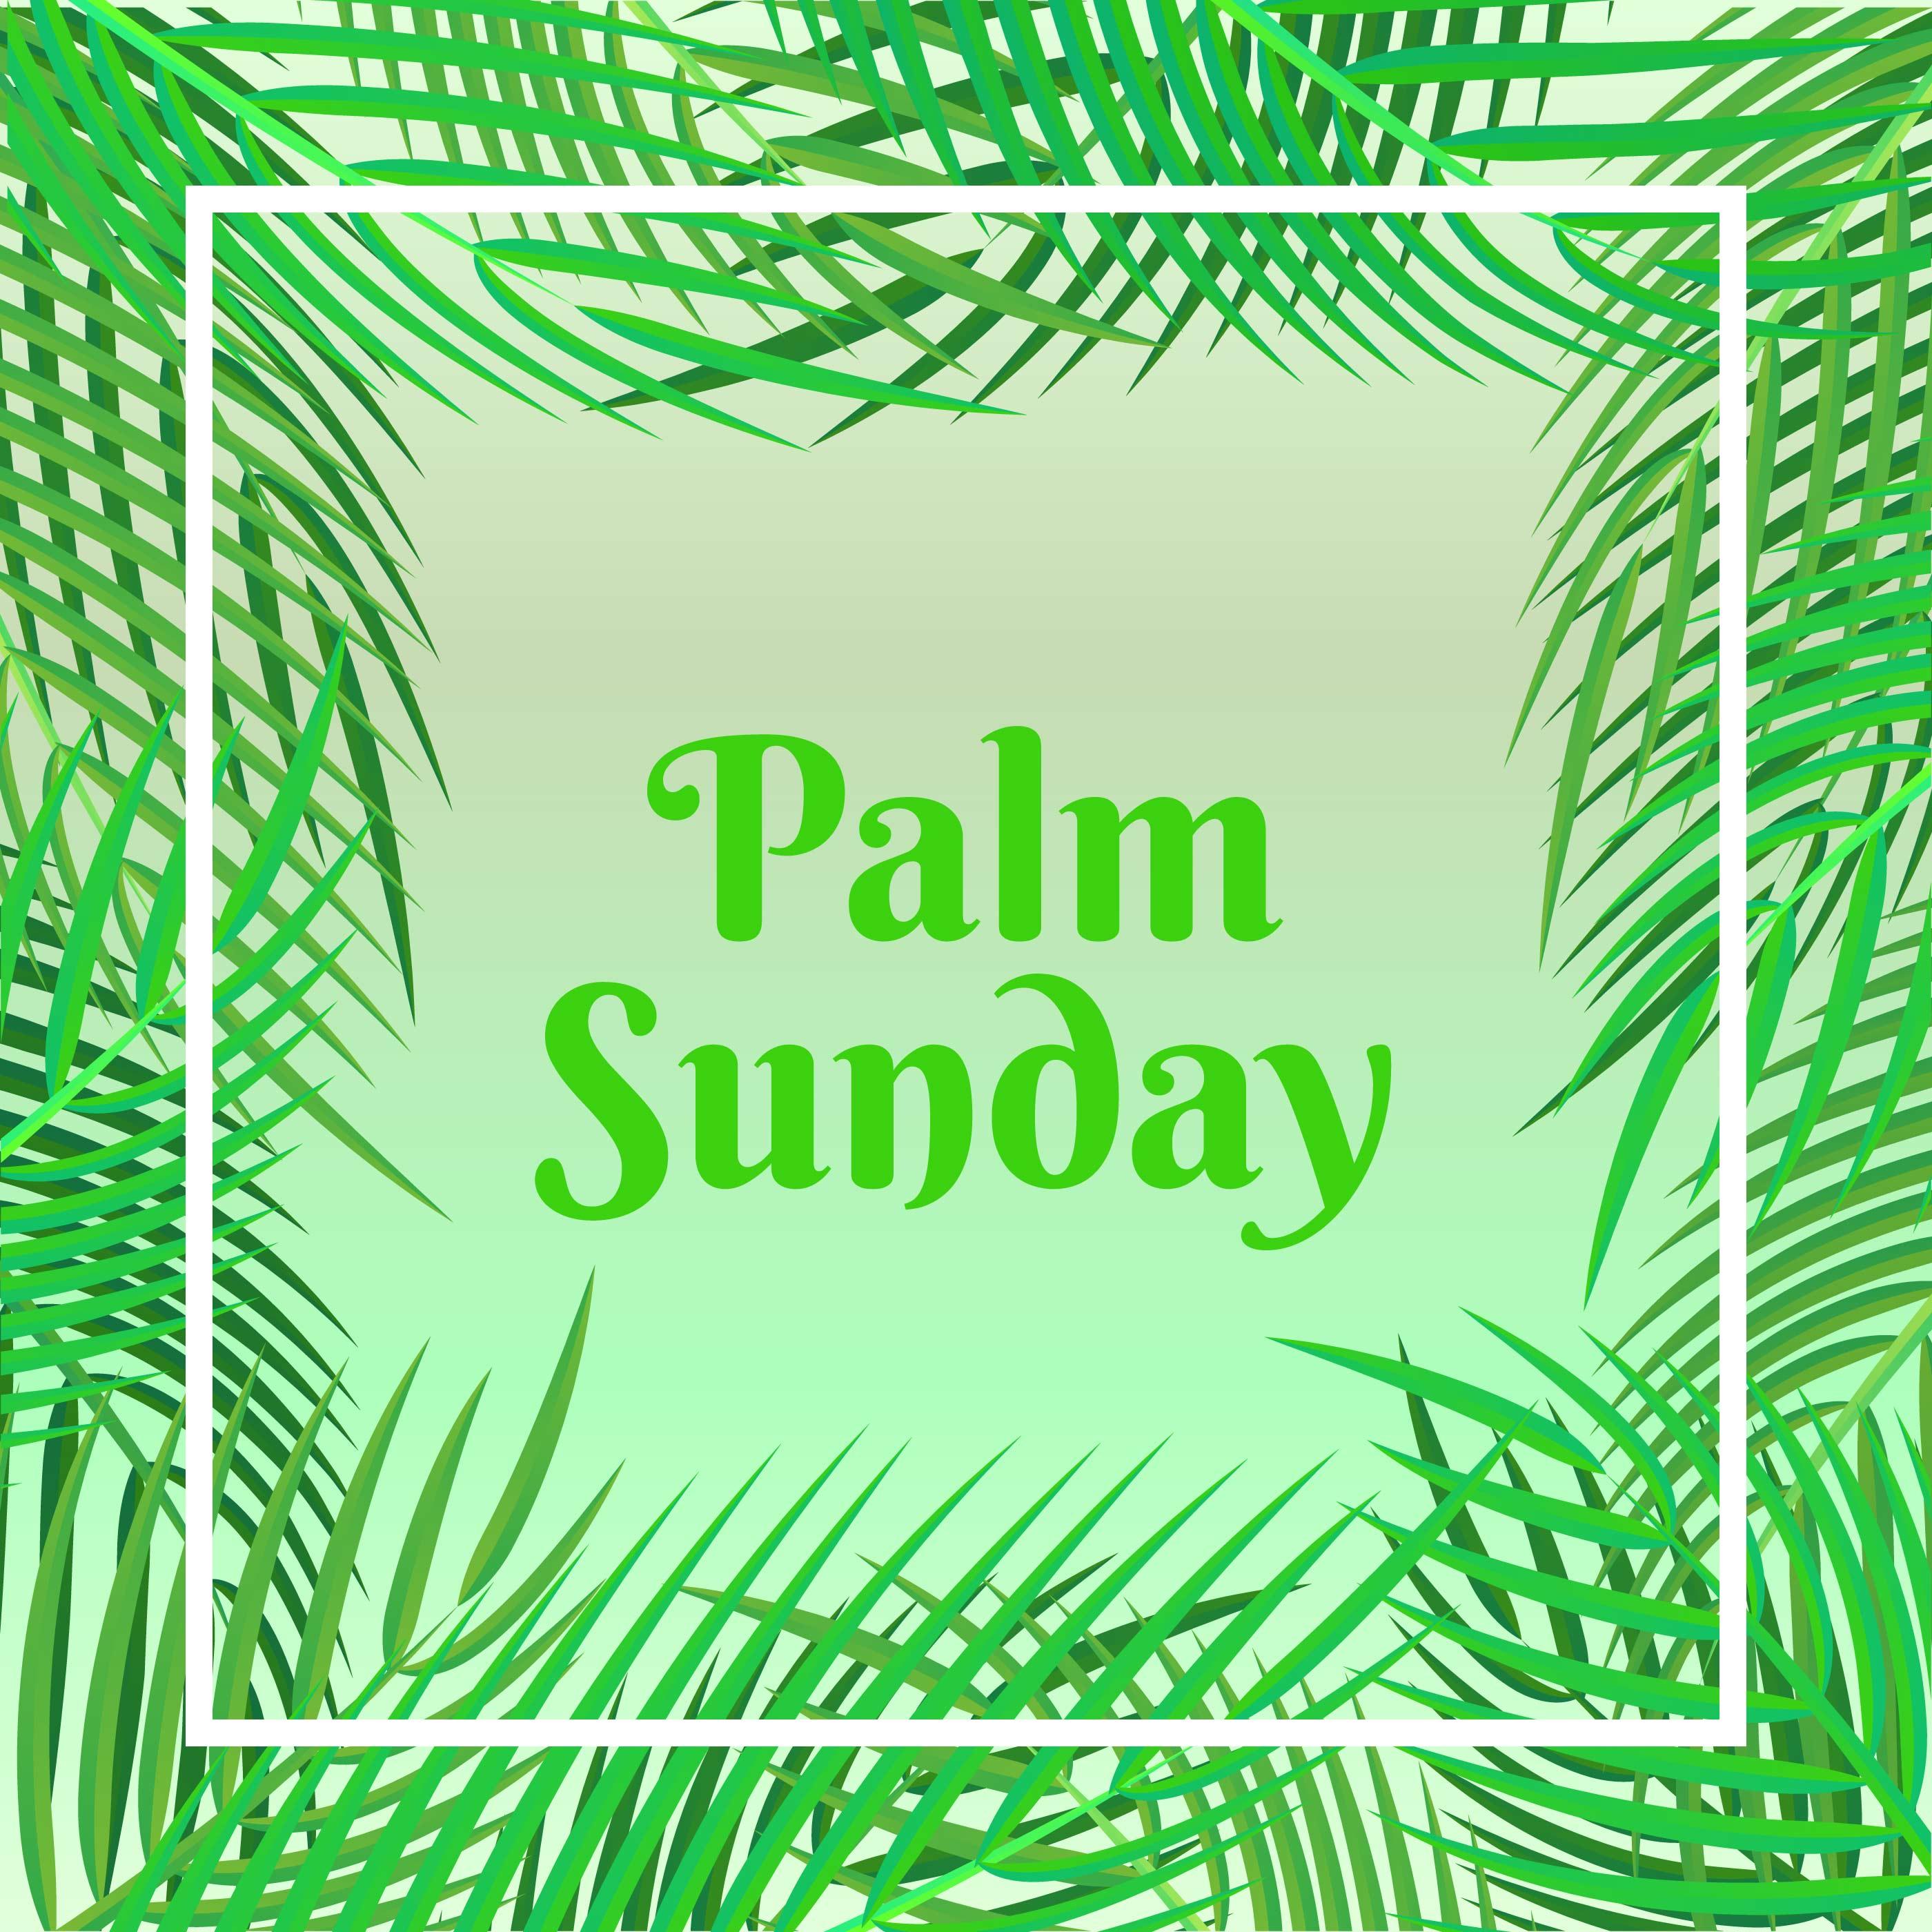 Palm Sunday PDF Free Download